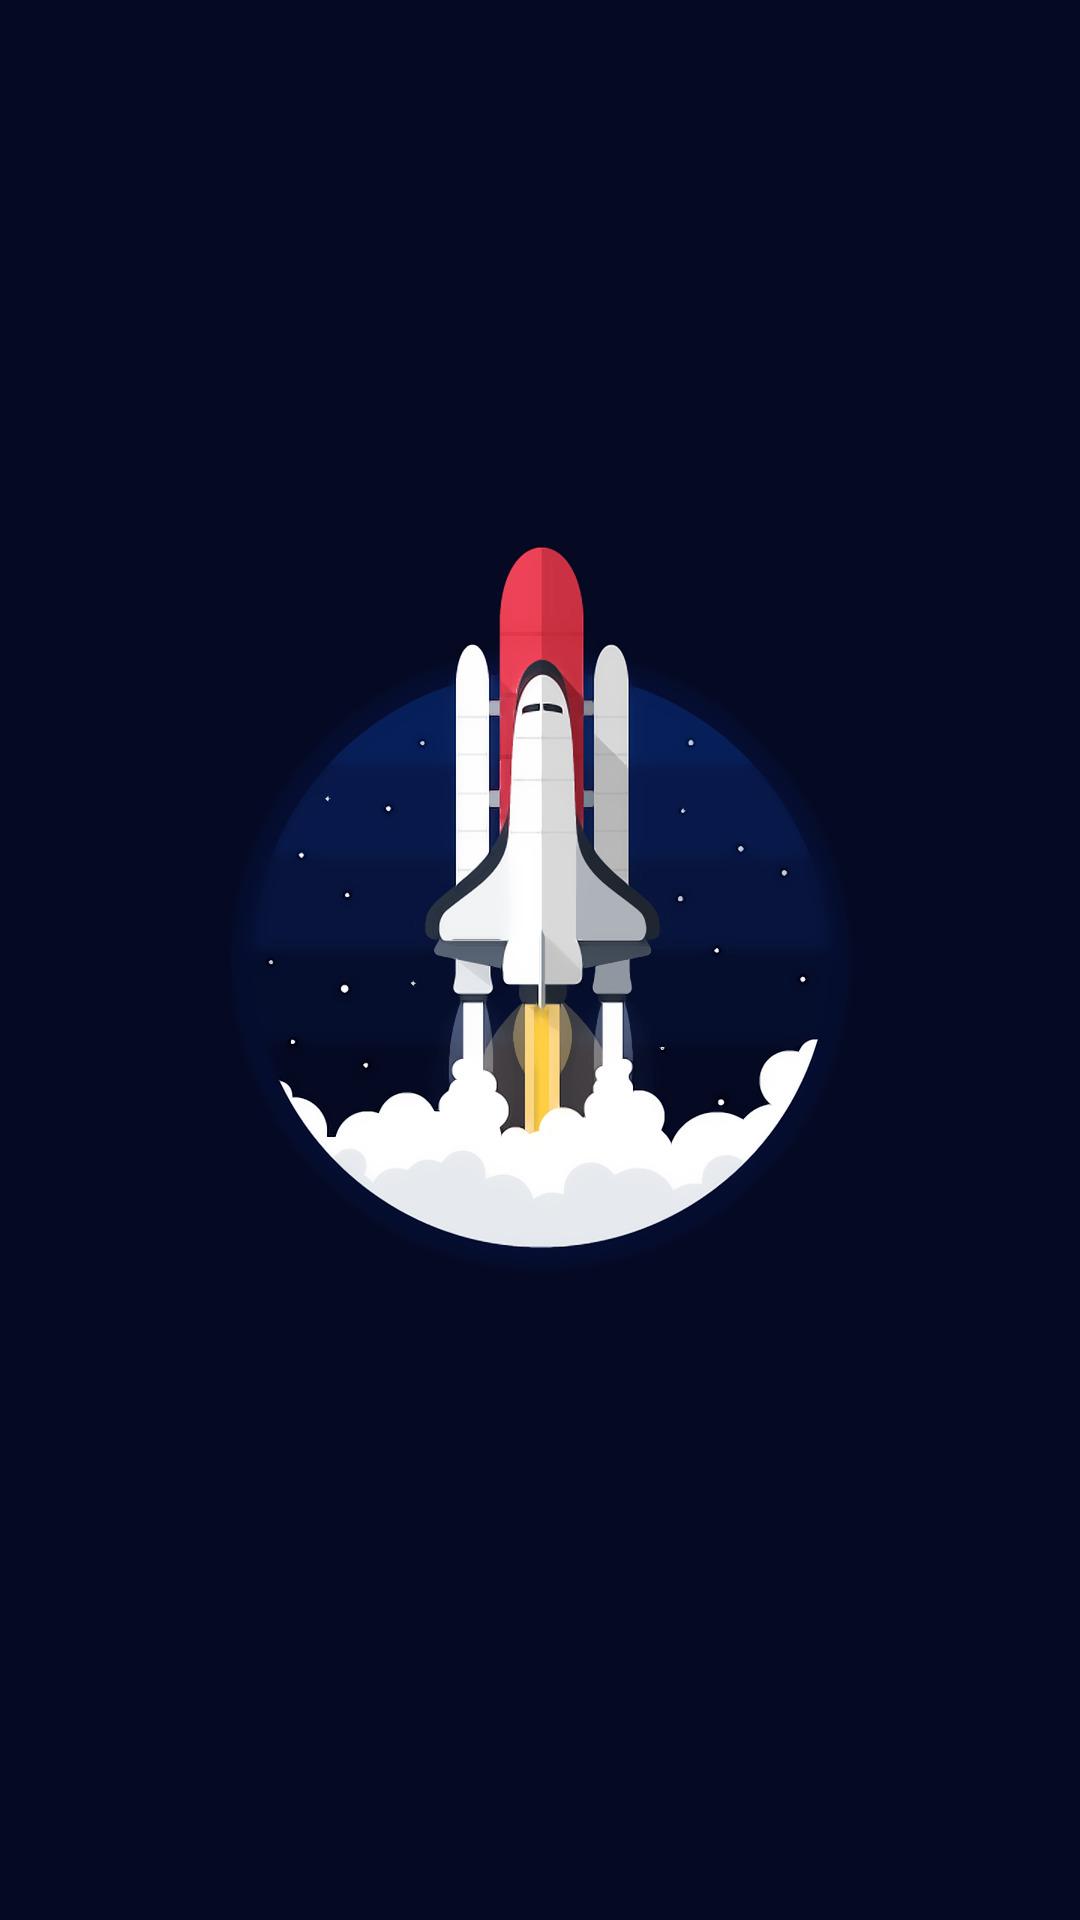 I Want To Believe Wallpaper Iphone Digital Art Portrait Display Rockets Spaceship Simple